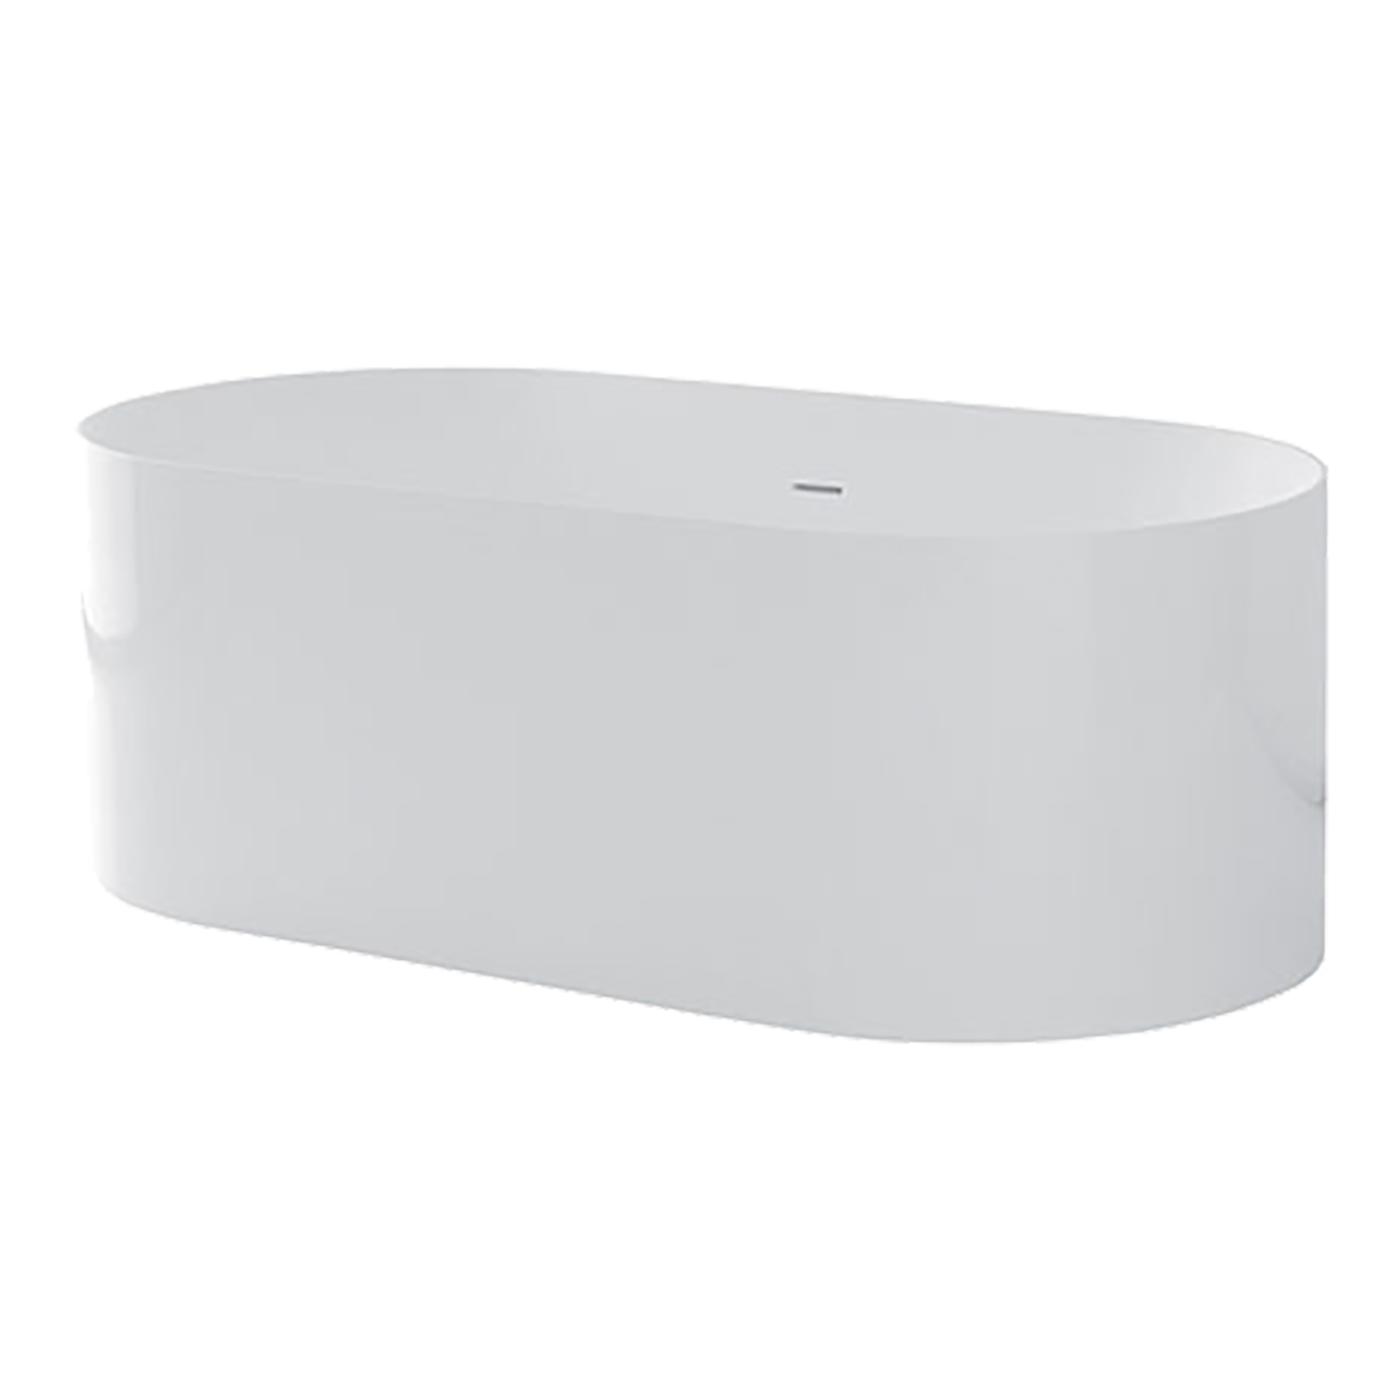 Vasca Da Bagno Kerasan : Vasca da bagno ovale g&m